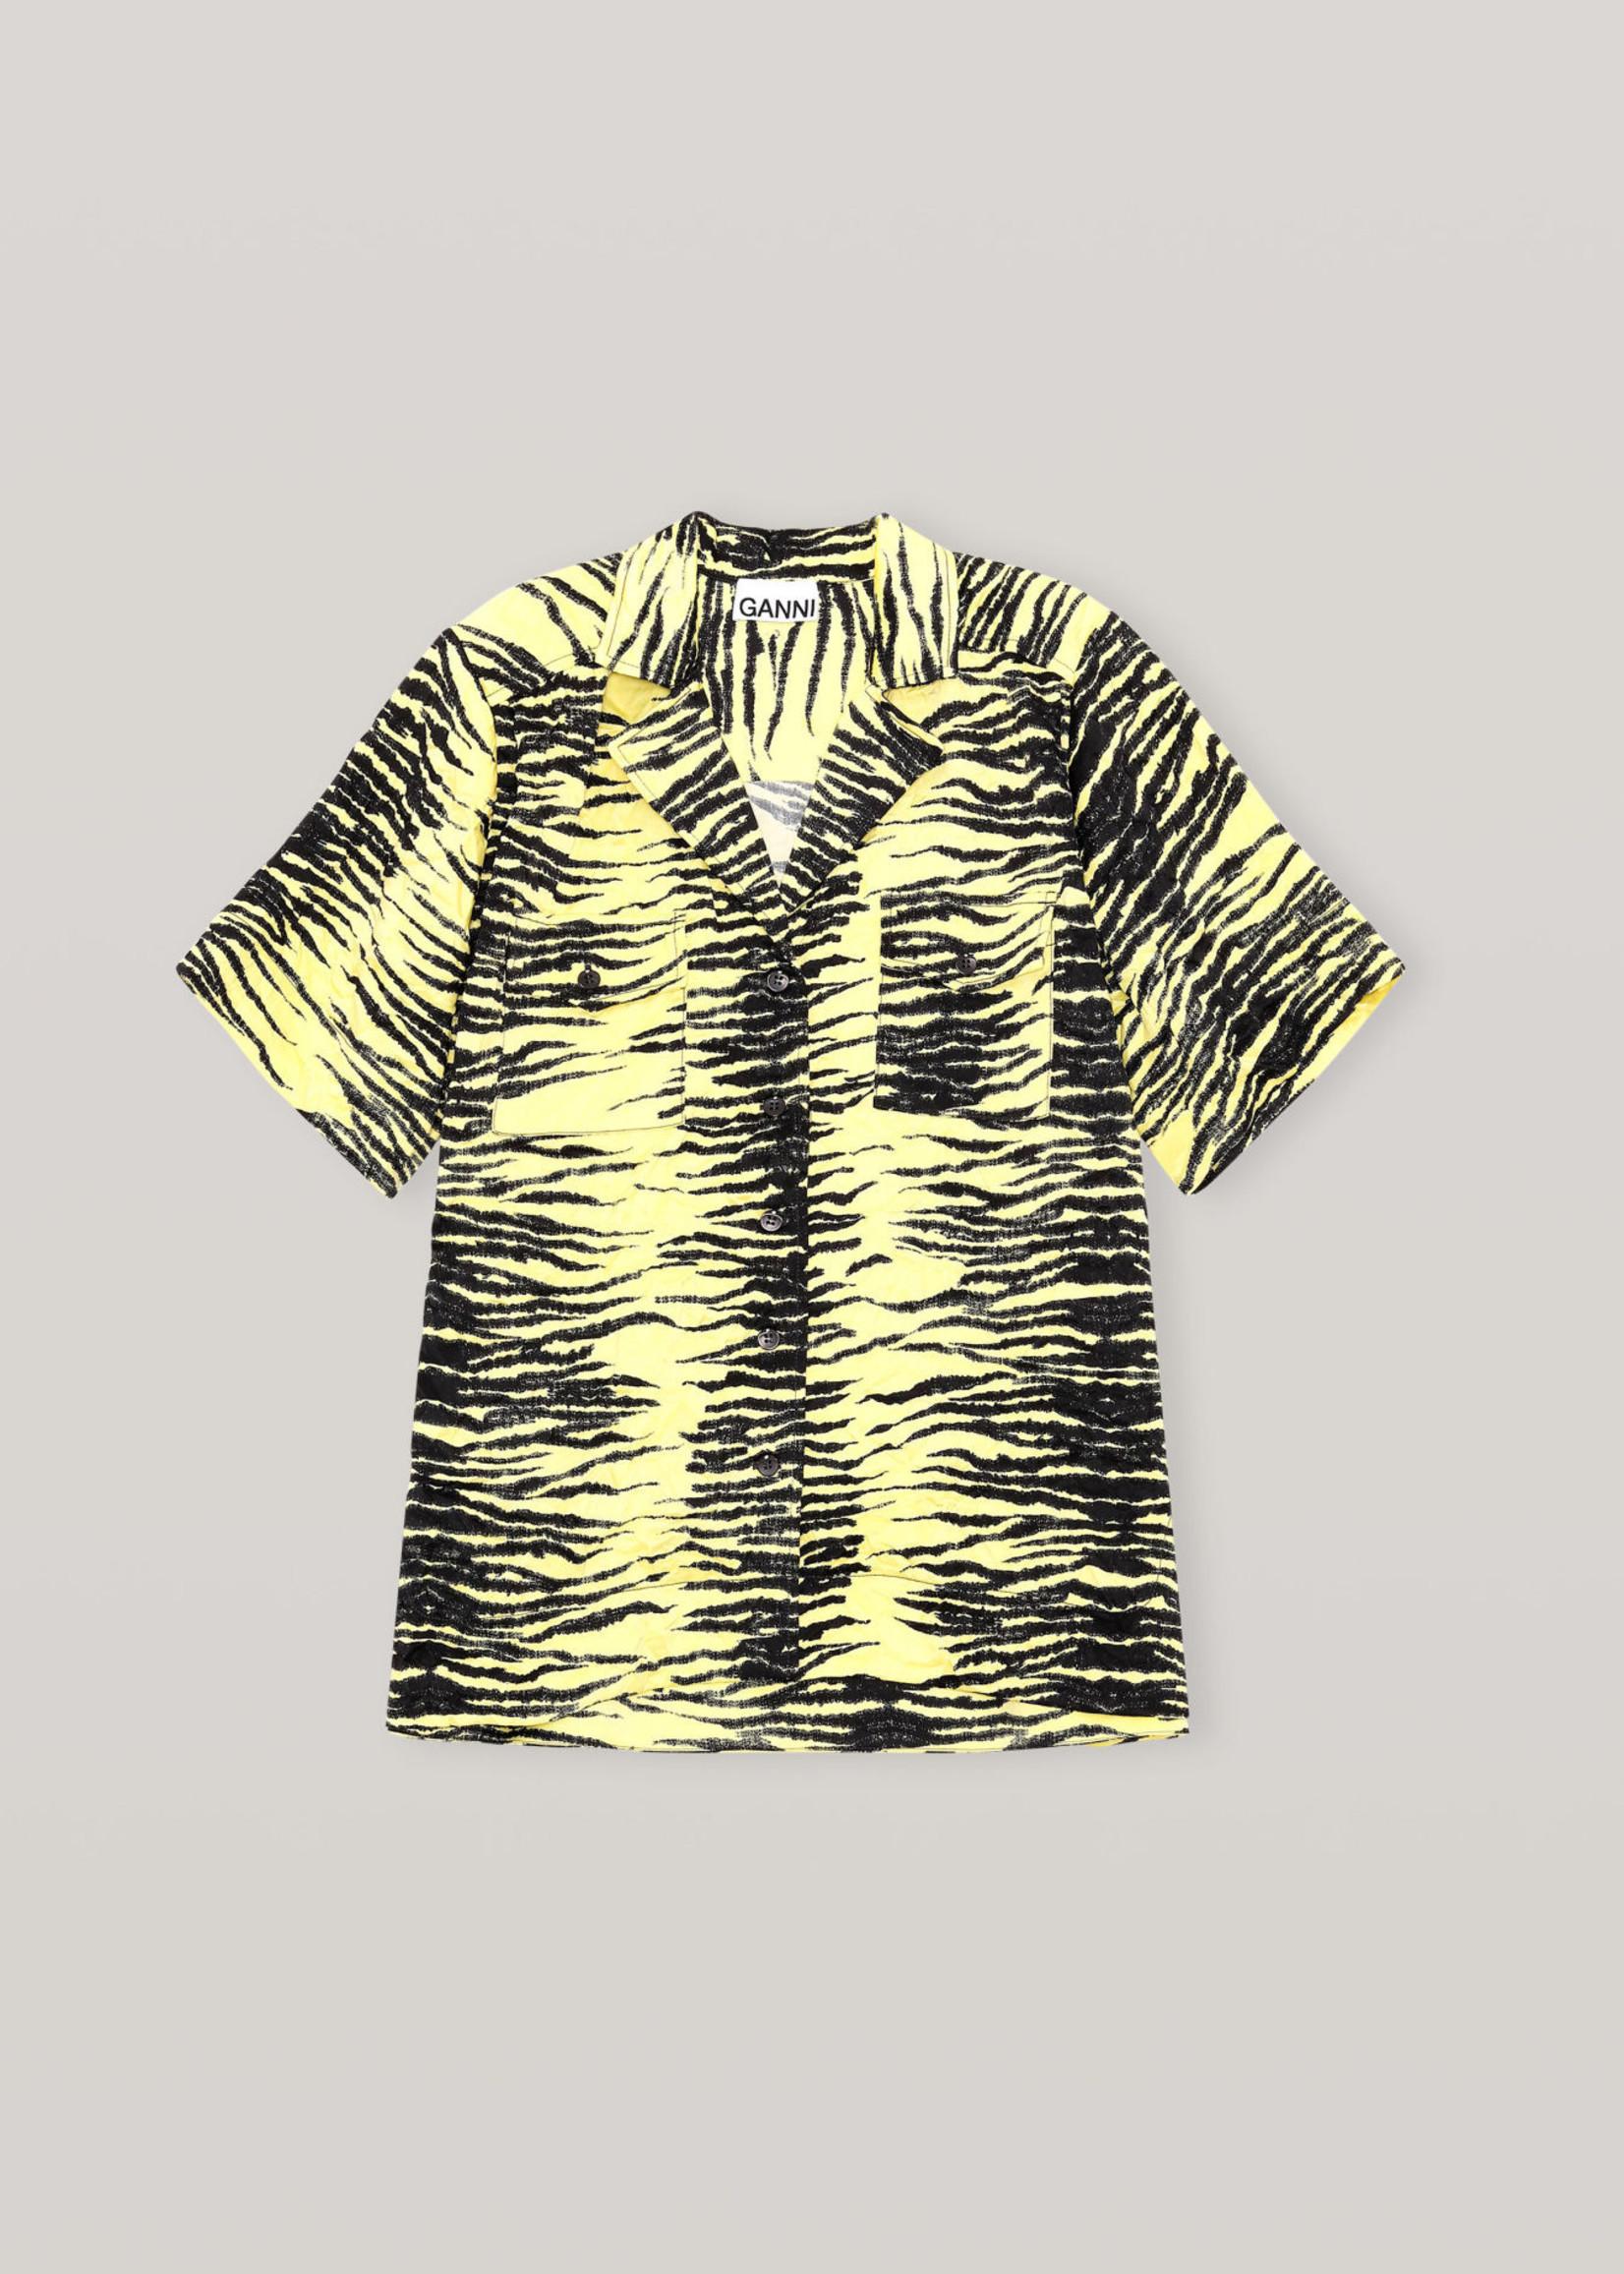 GANNI Crinkled Satin Shirt in Yellow Print